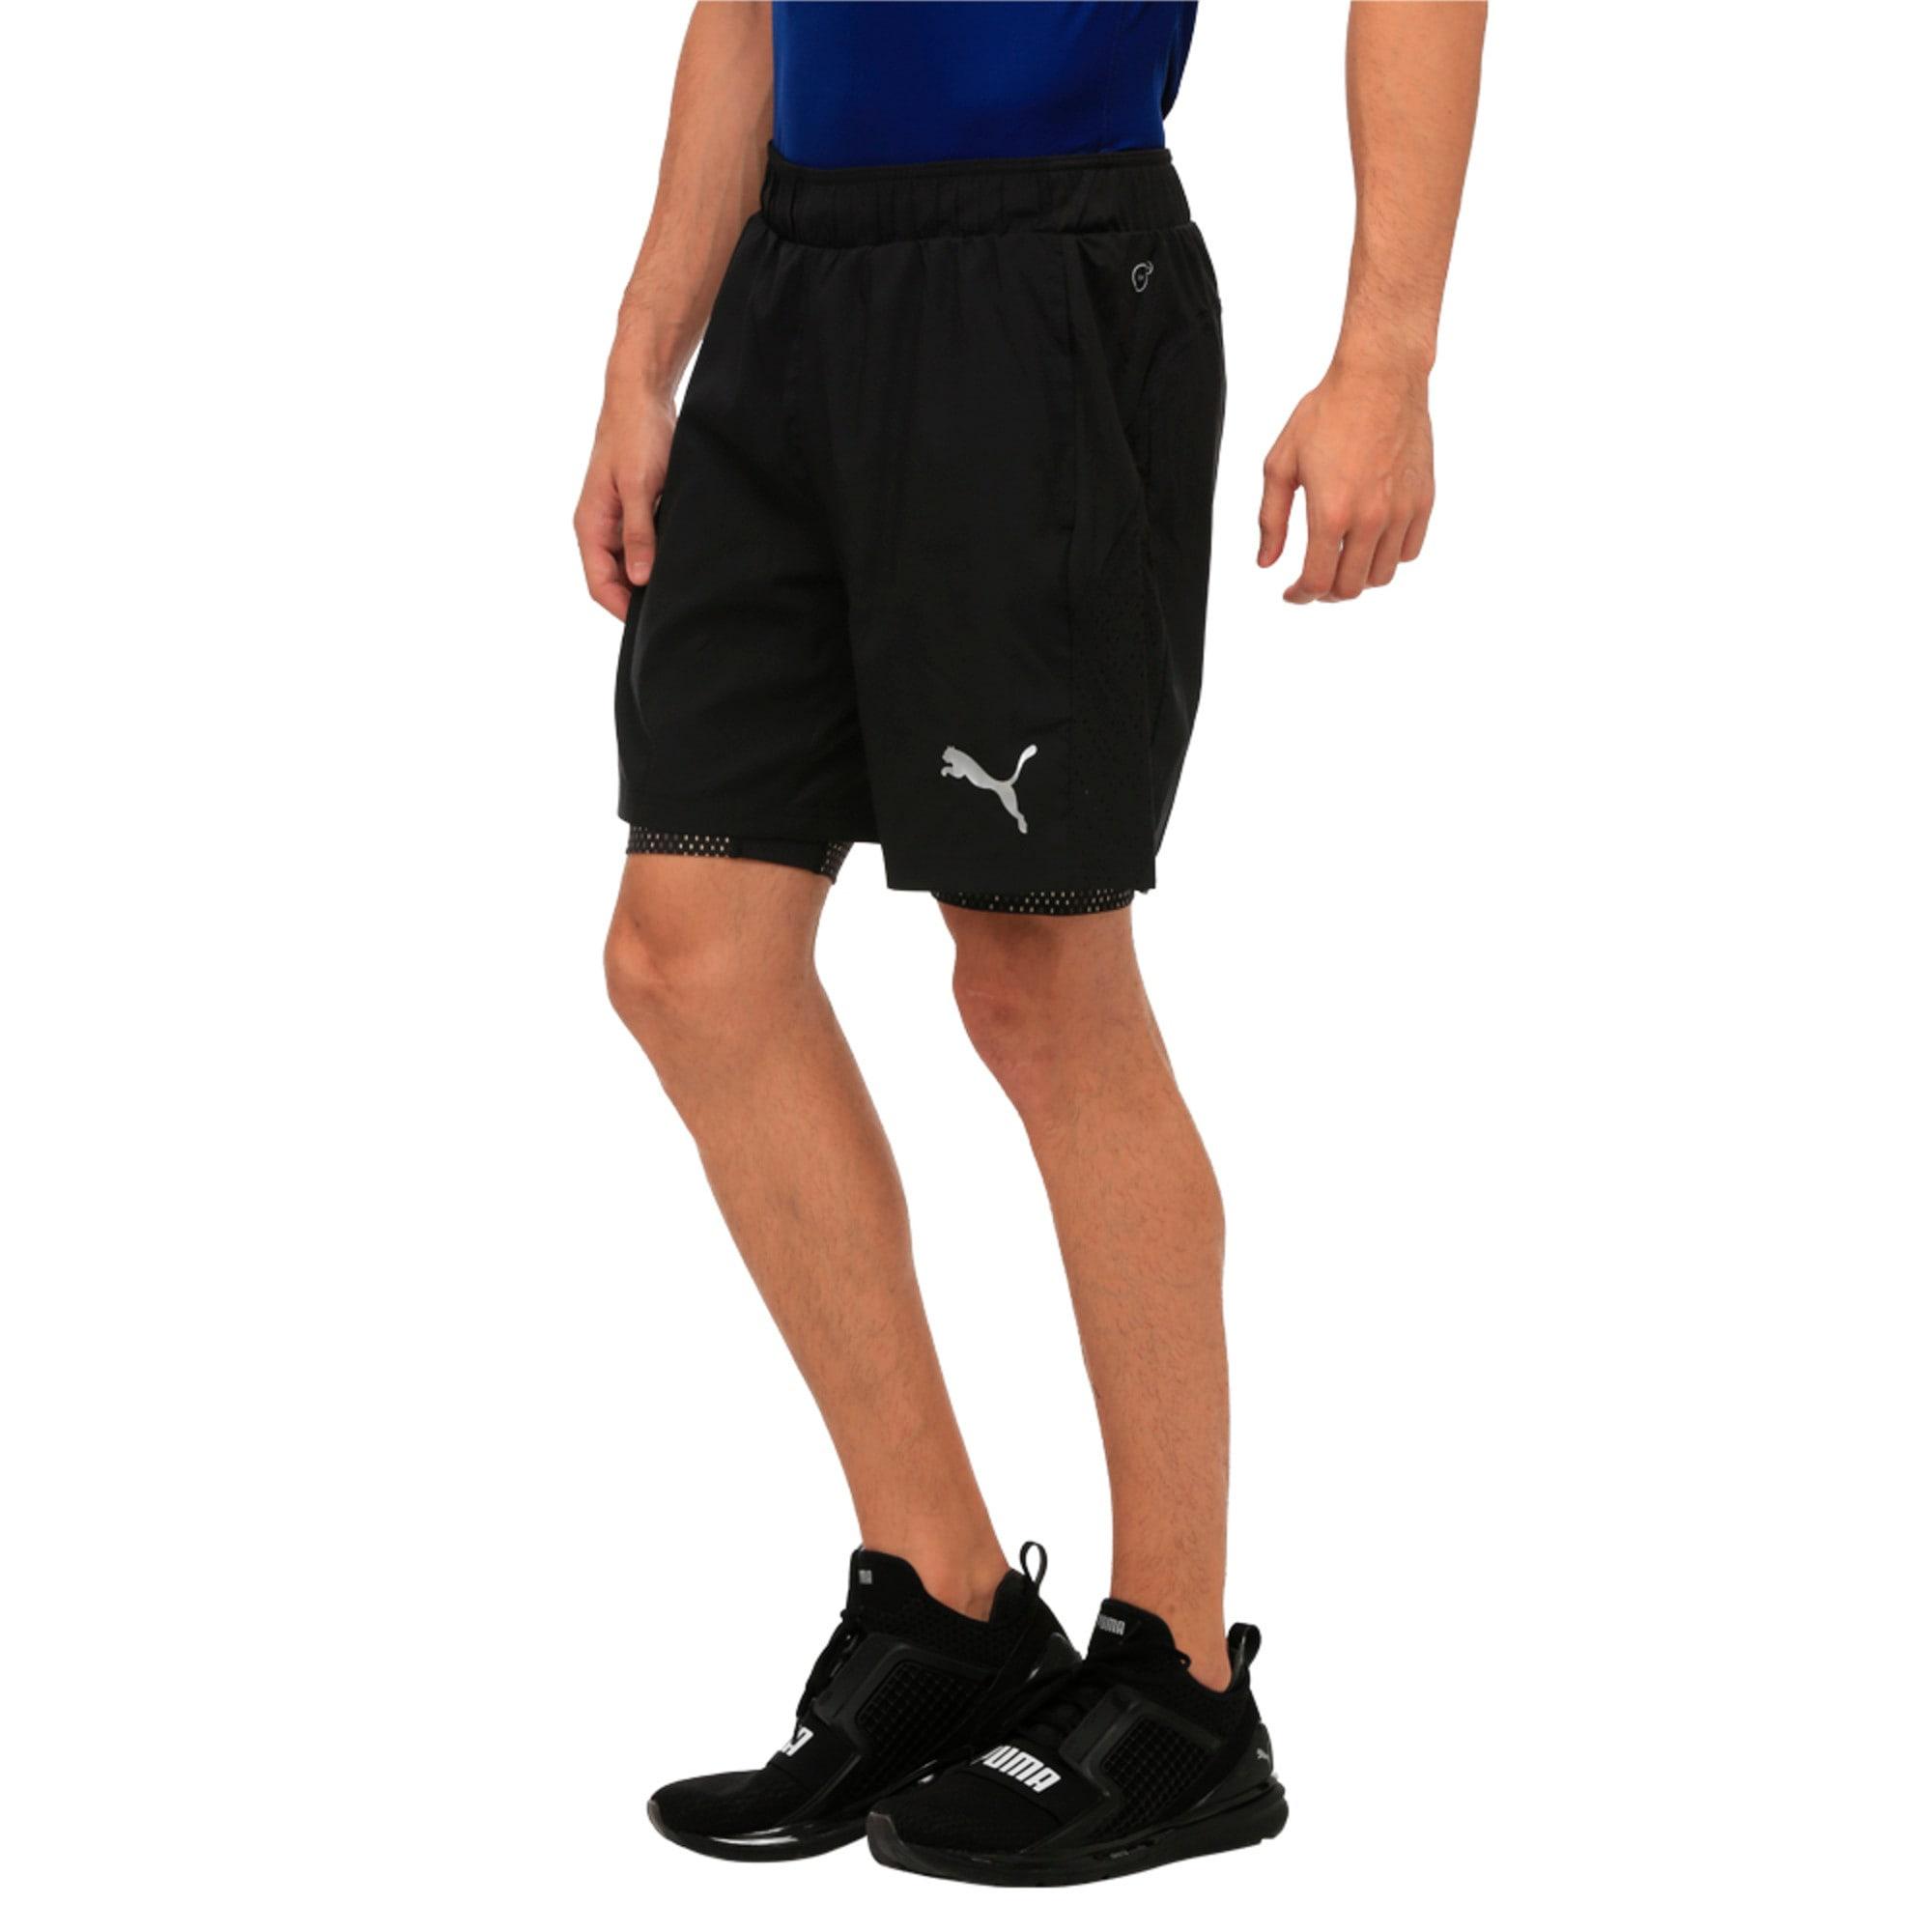 Thumbnail 5 of Active Training Men's 2 in 1 Shorts, Puma Black, medium-IND